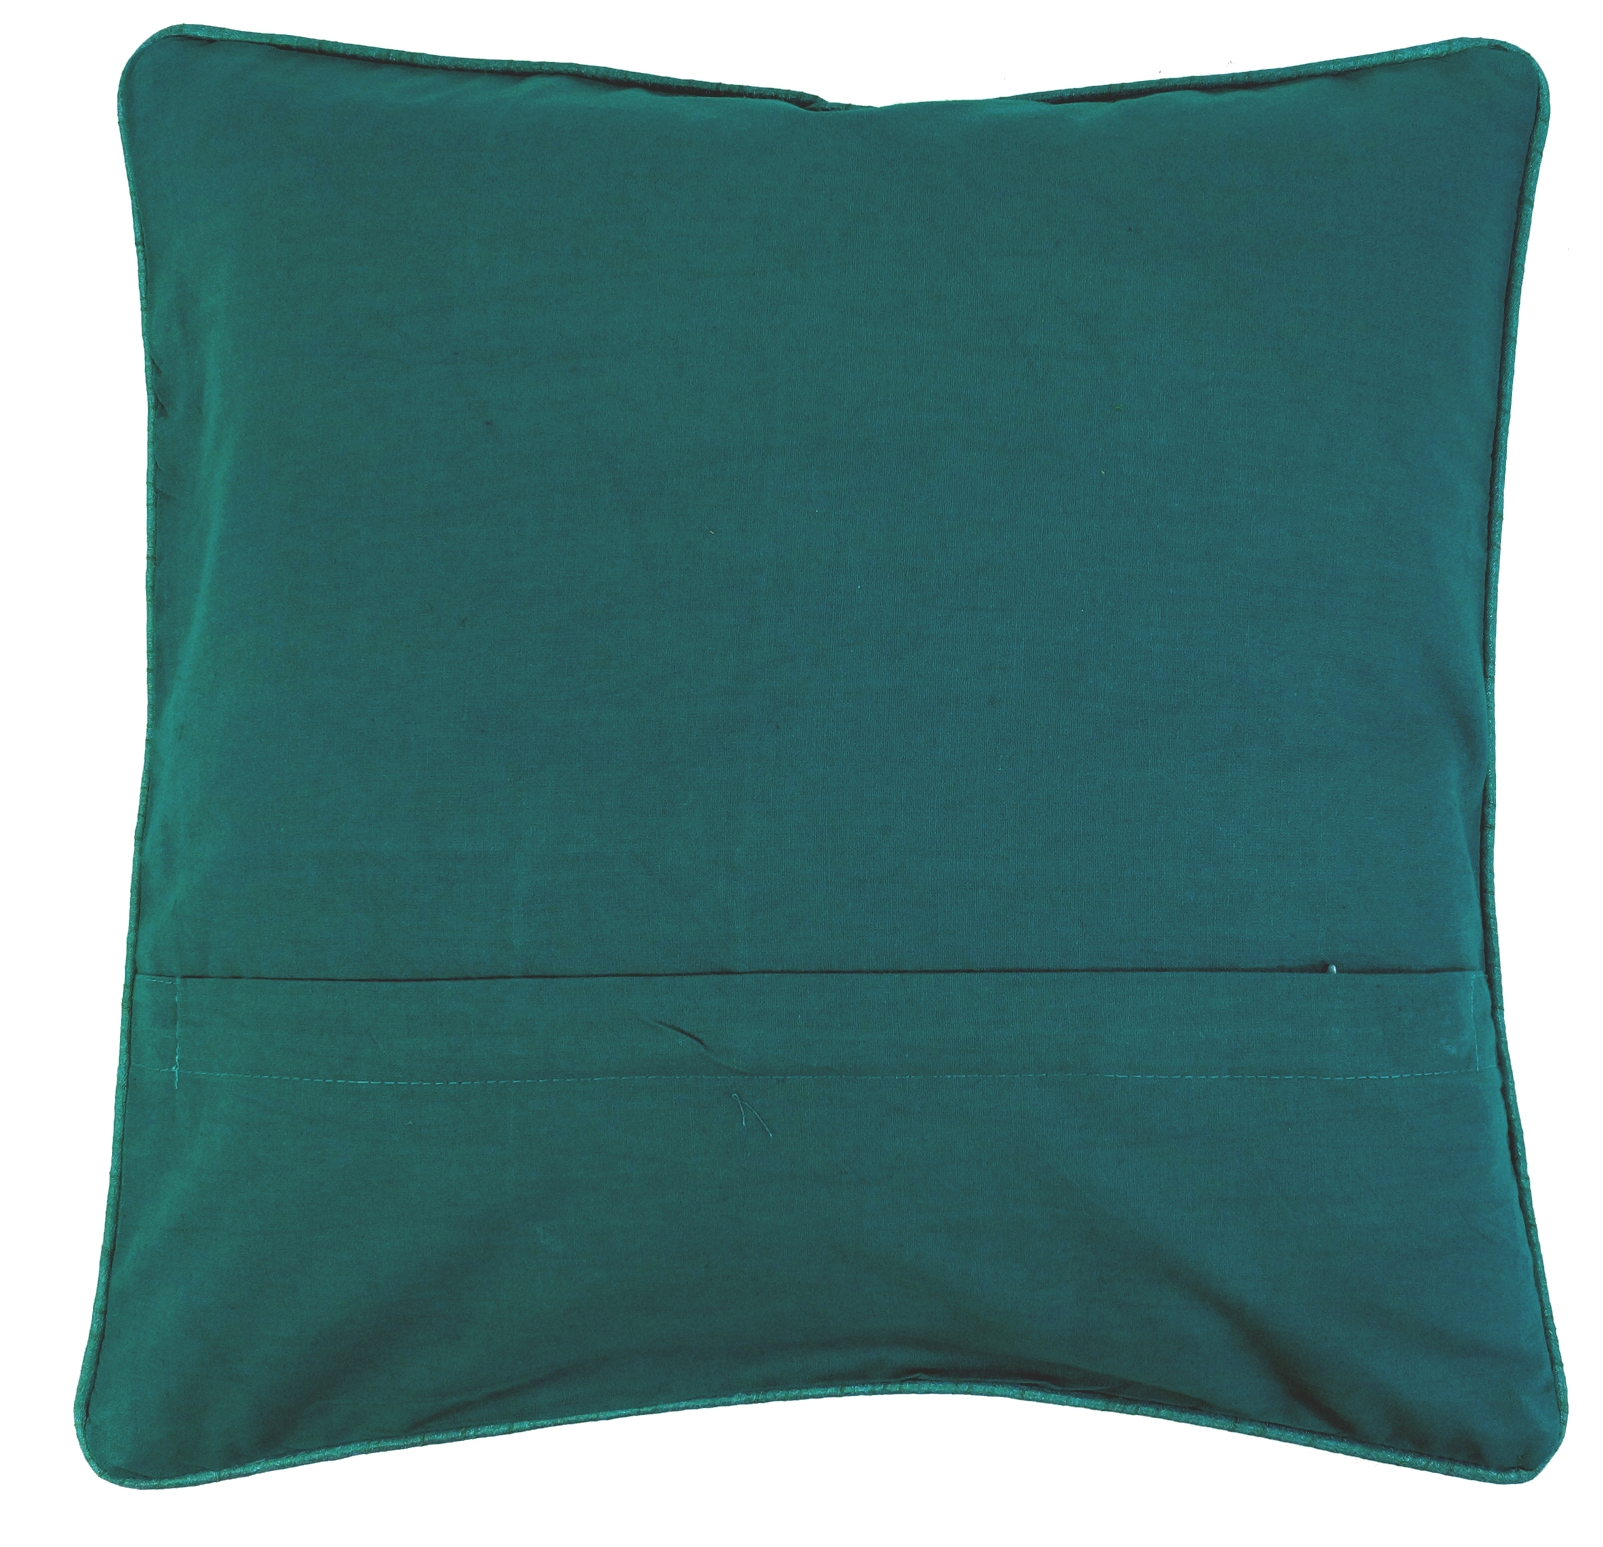 orientalische kissenh lle kissenbezug saree patchwork t rkis 40x40x0 5 cm. Black Bedroom Furniture Sets. Home Design Ideas